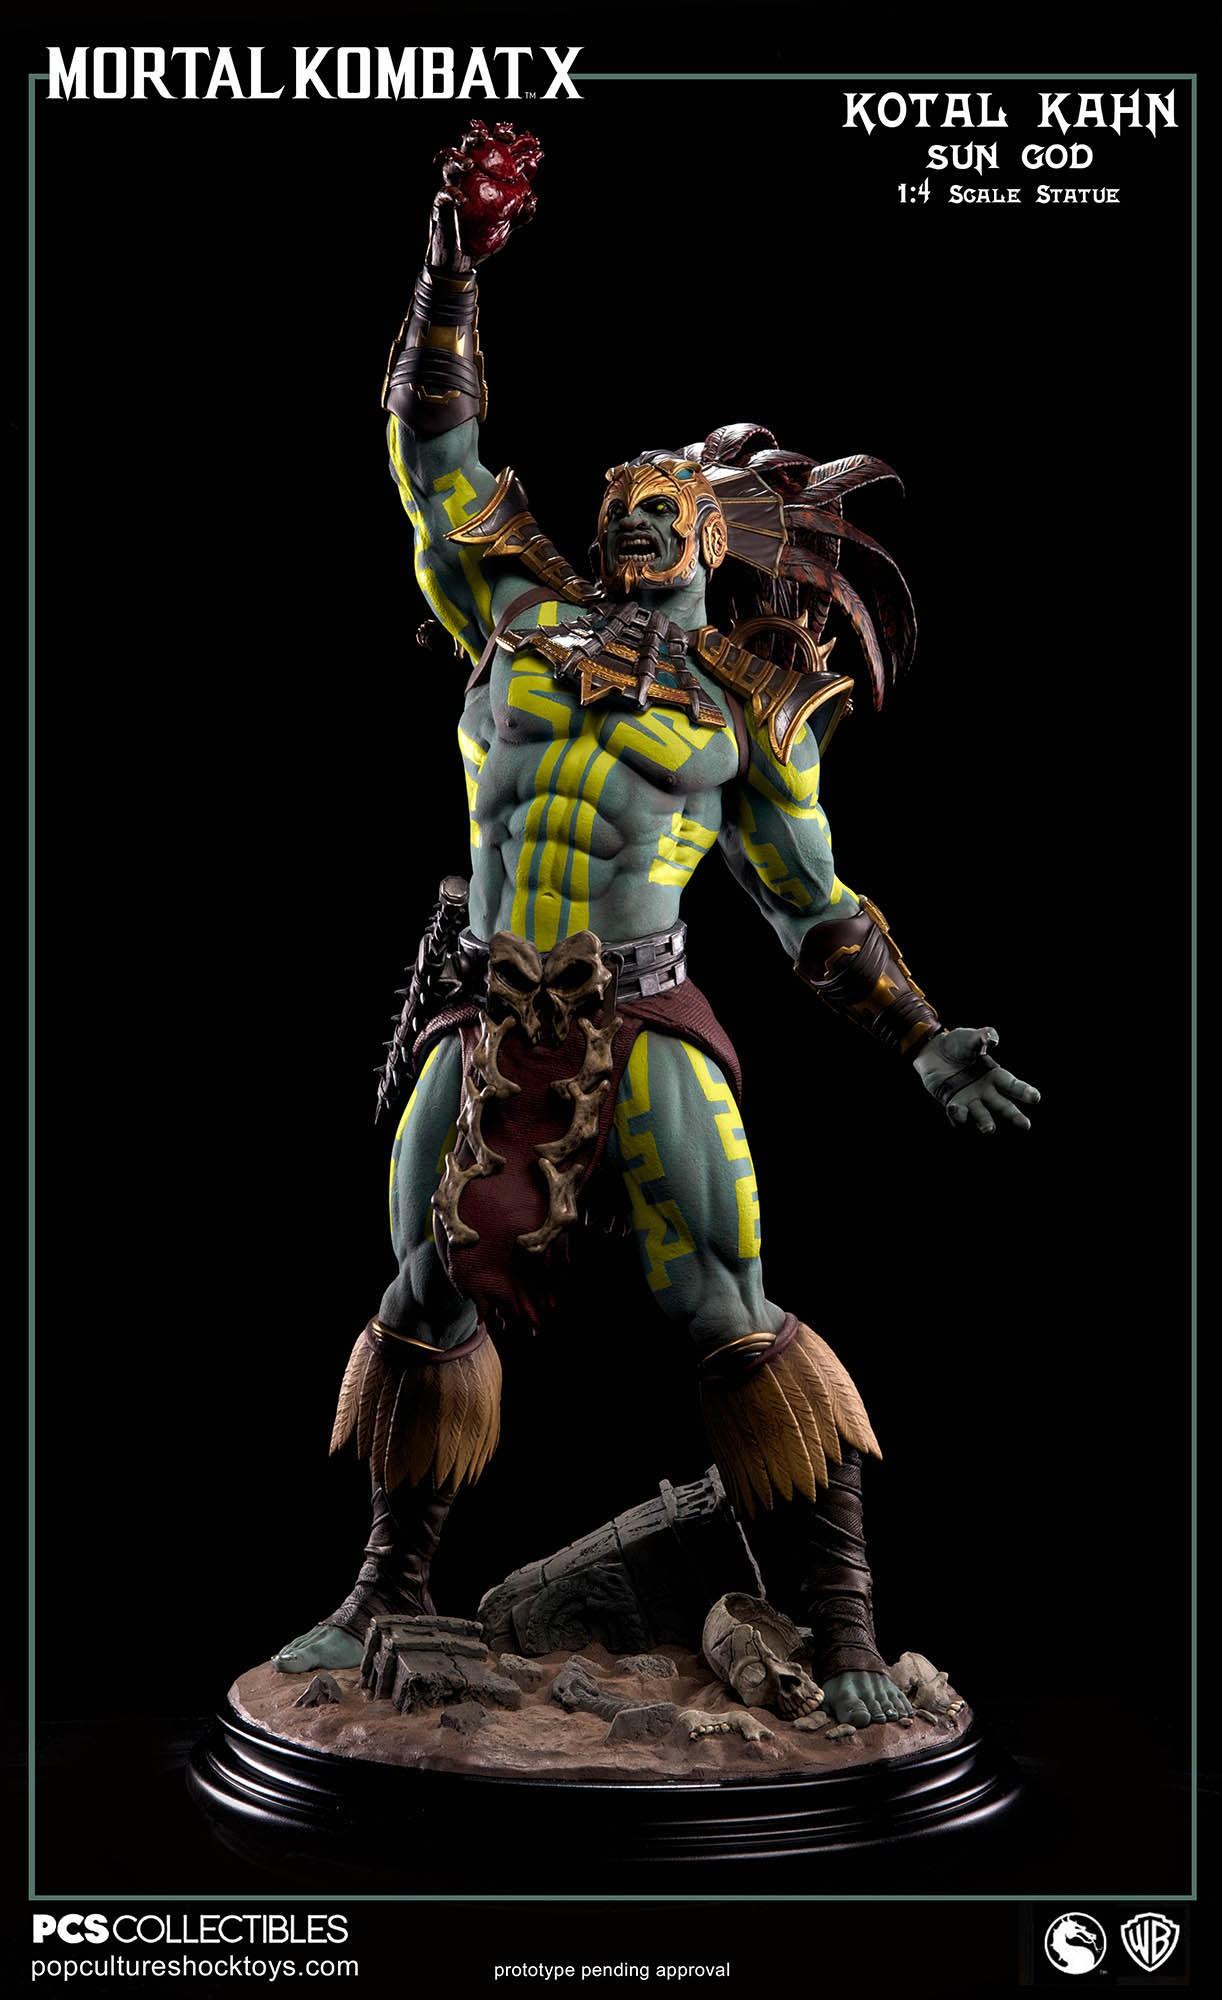 [Pop Culture Shock] Mortal Kombat X: Kotal Kahn 1:4 scale PCS-Kotal-Kahn-Sun-God-009